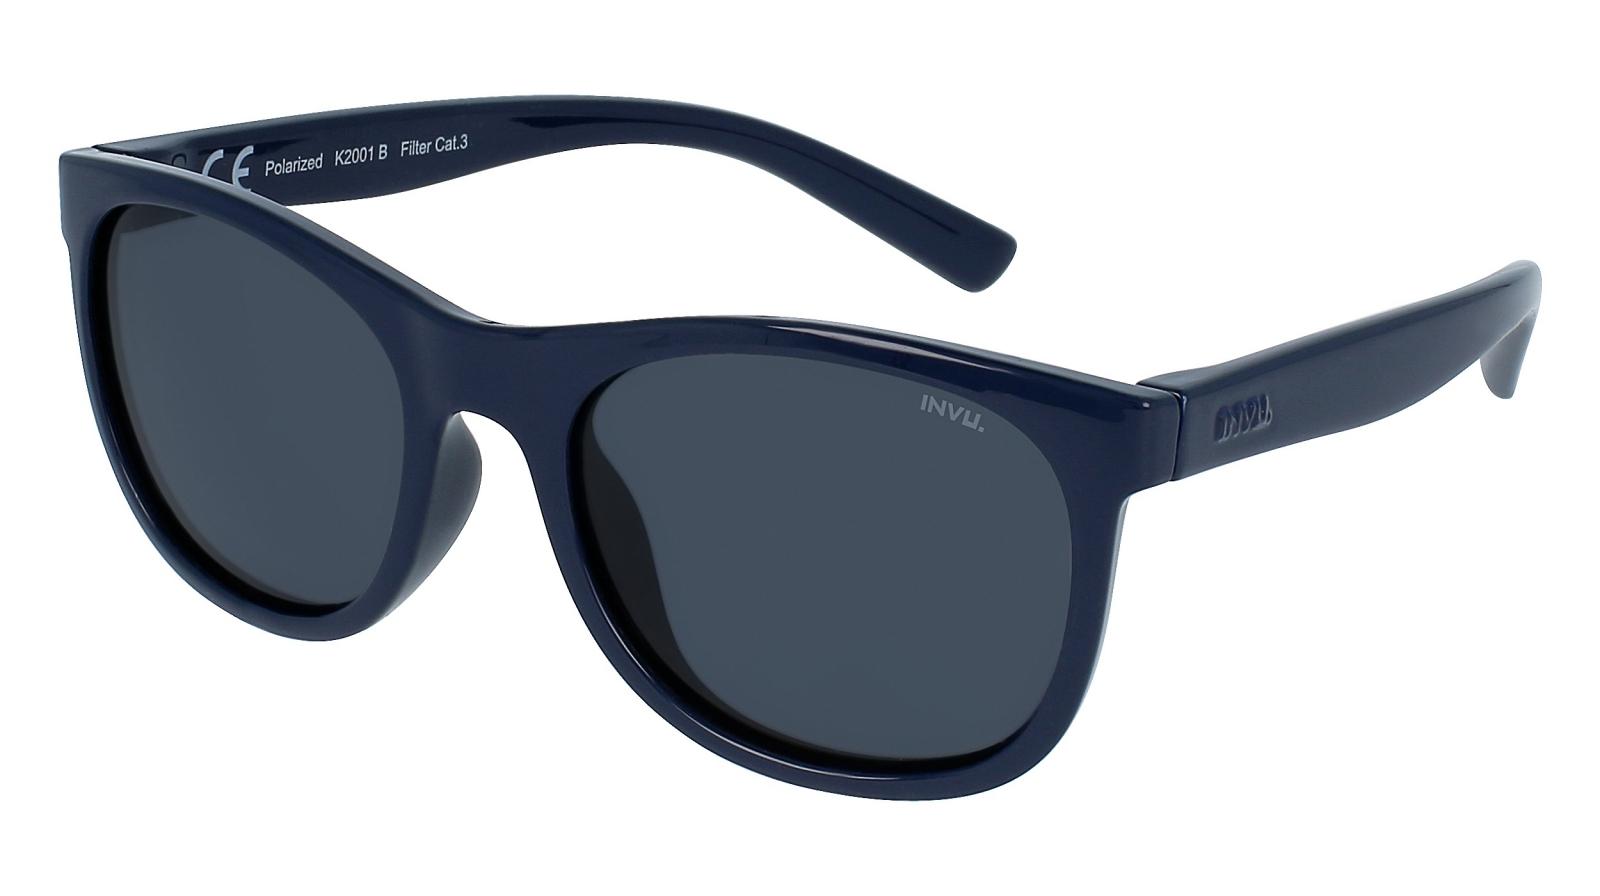 INVU. Kids K2001B - Slnečné okuliare pre deti 4-7 r.